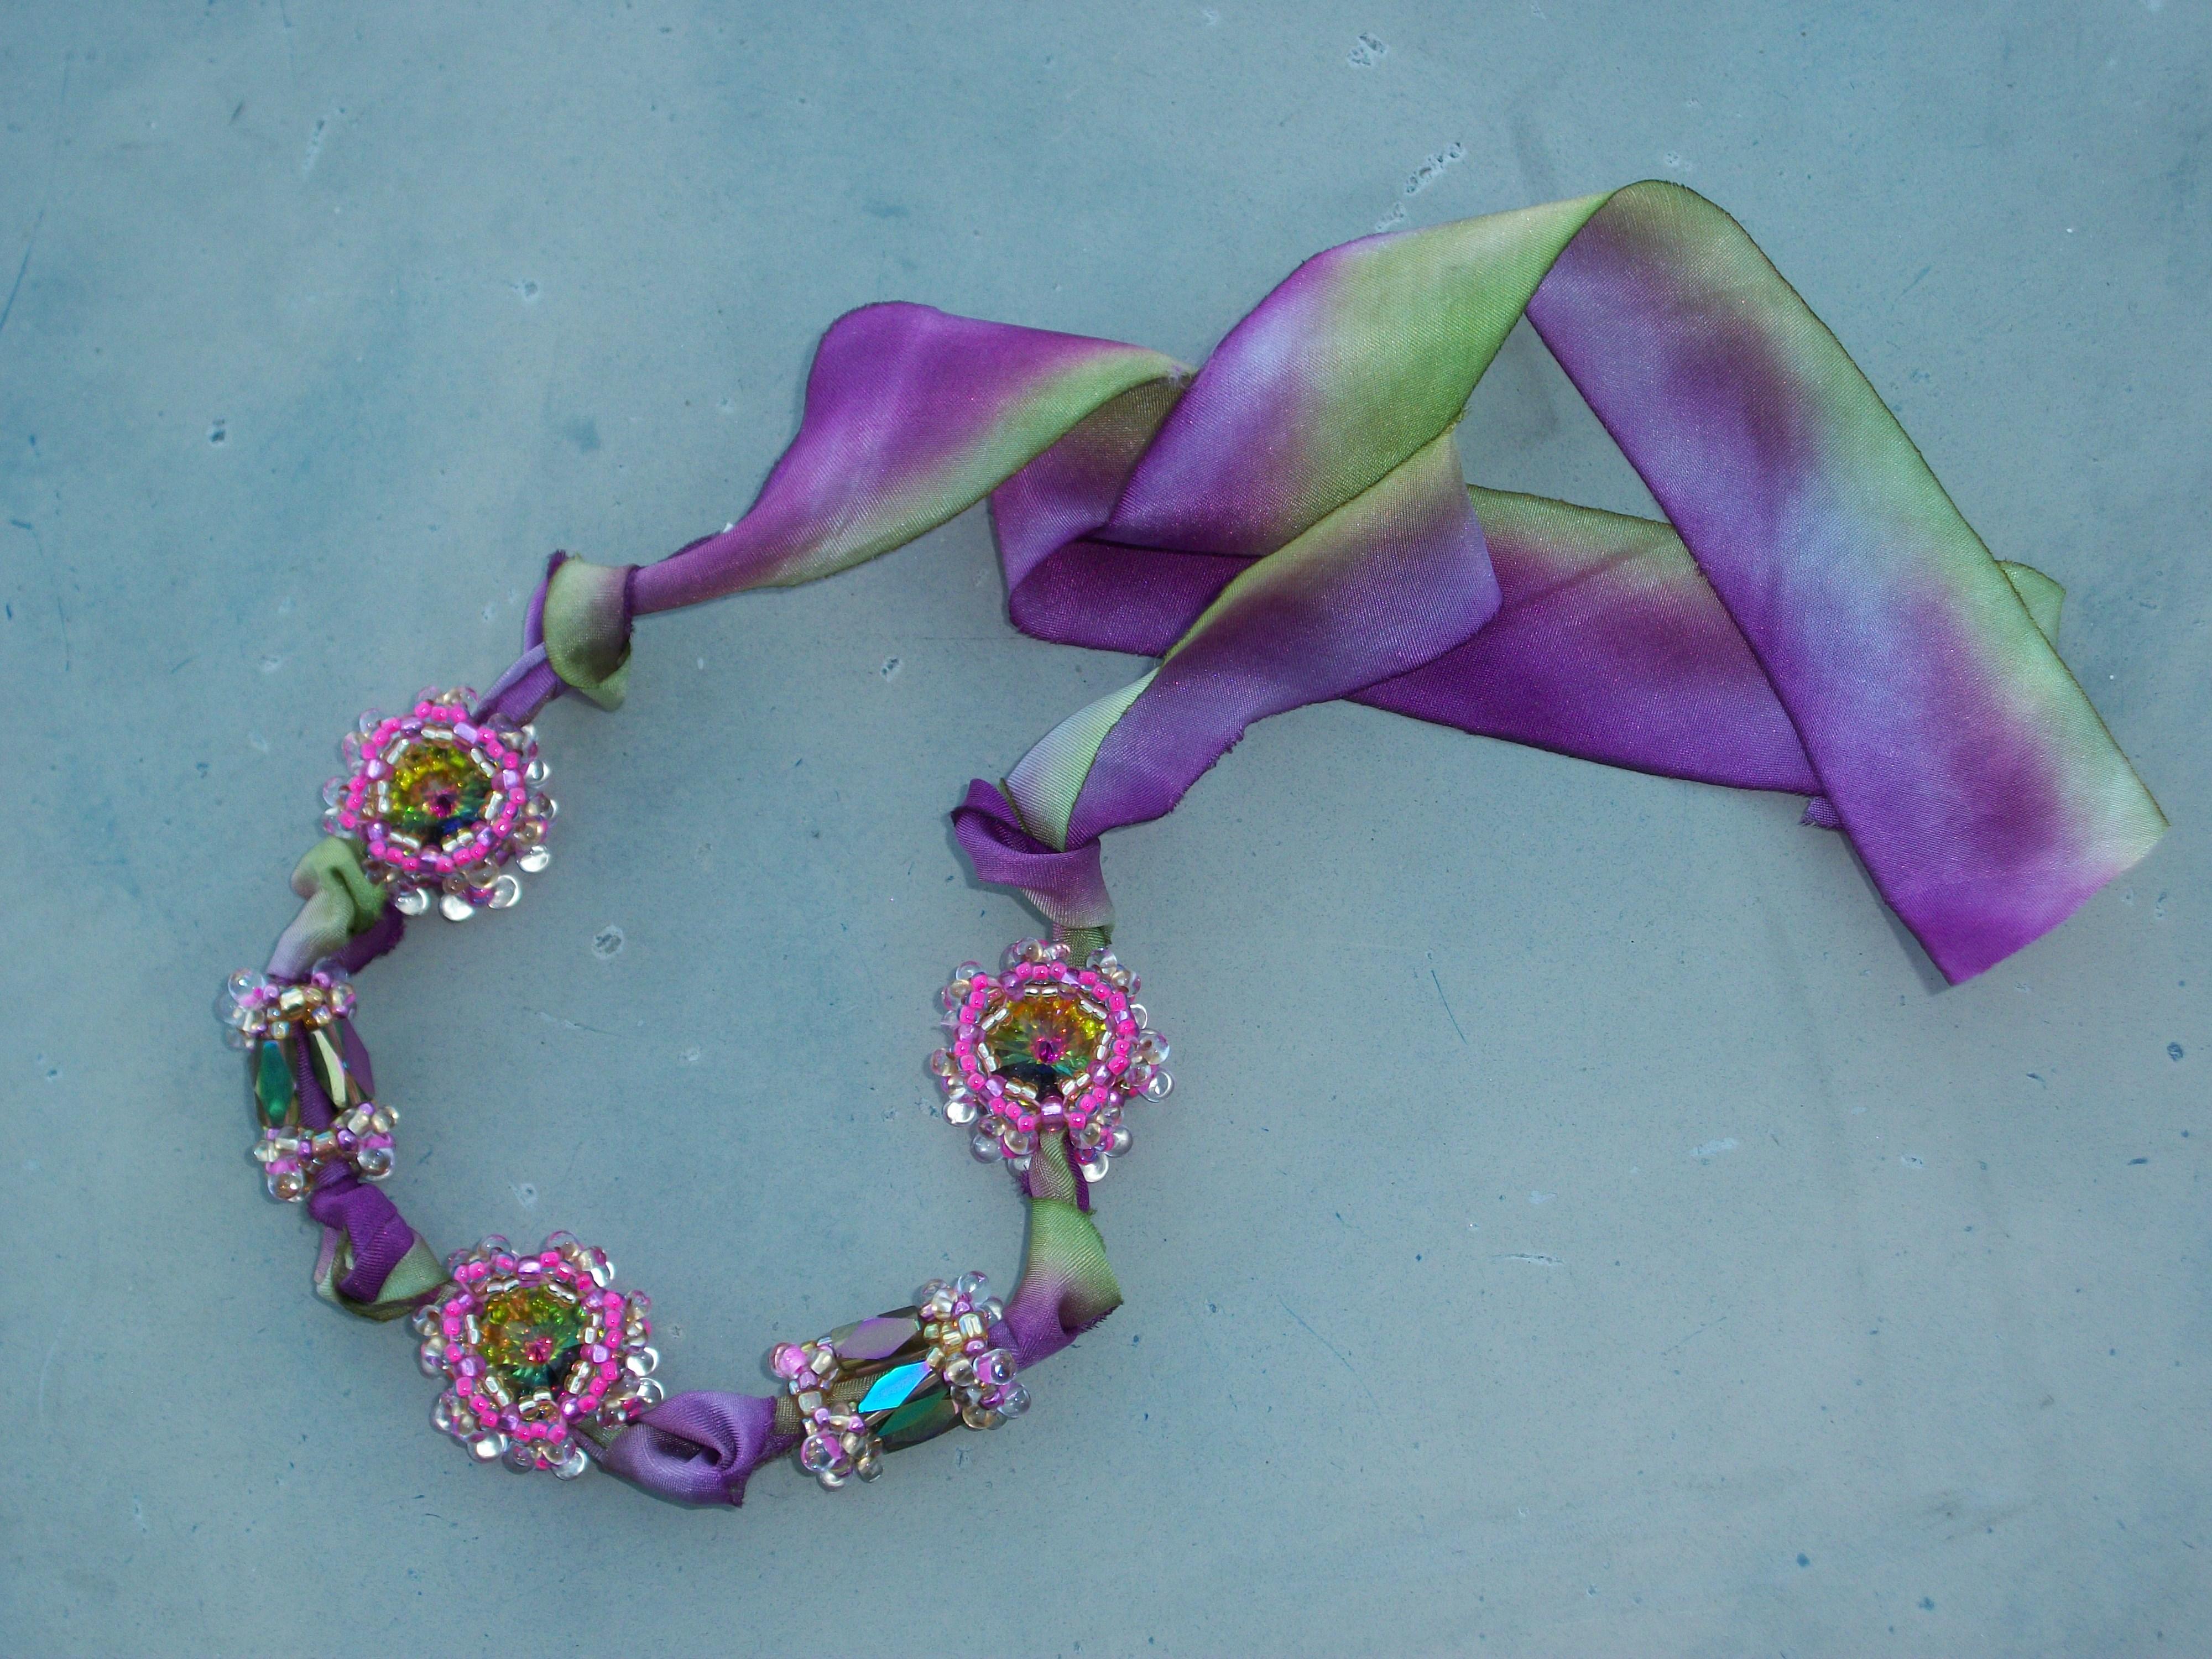 Prismatic Bezelled Rivolis and Beads